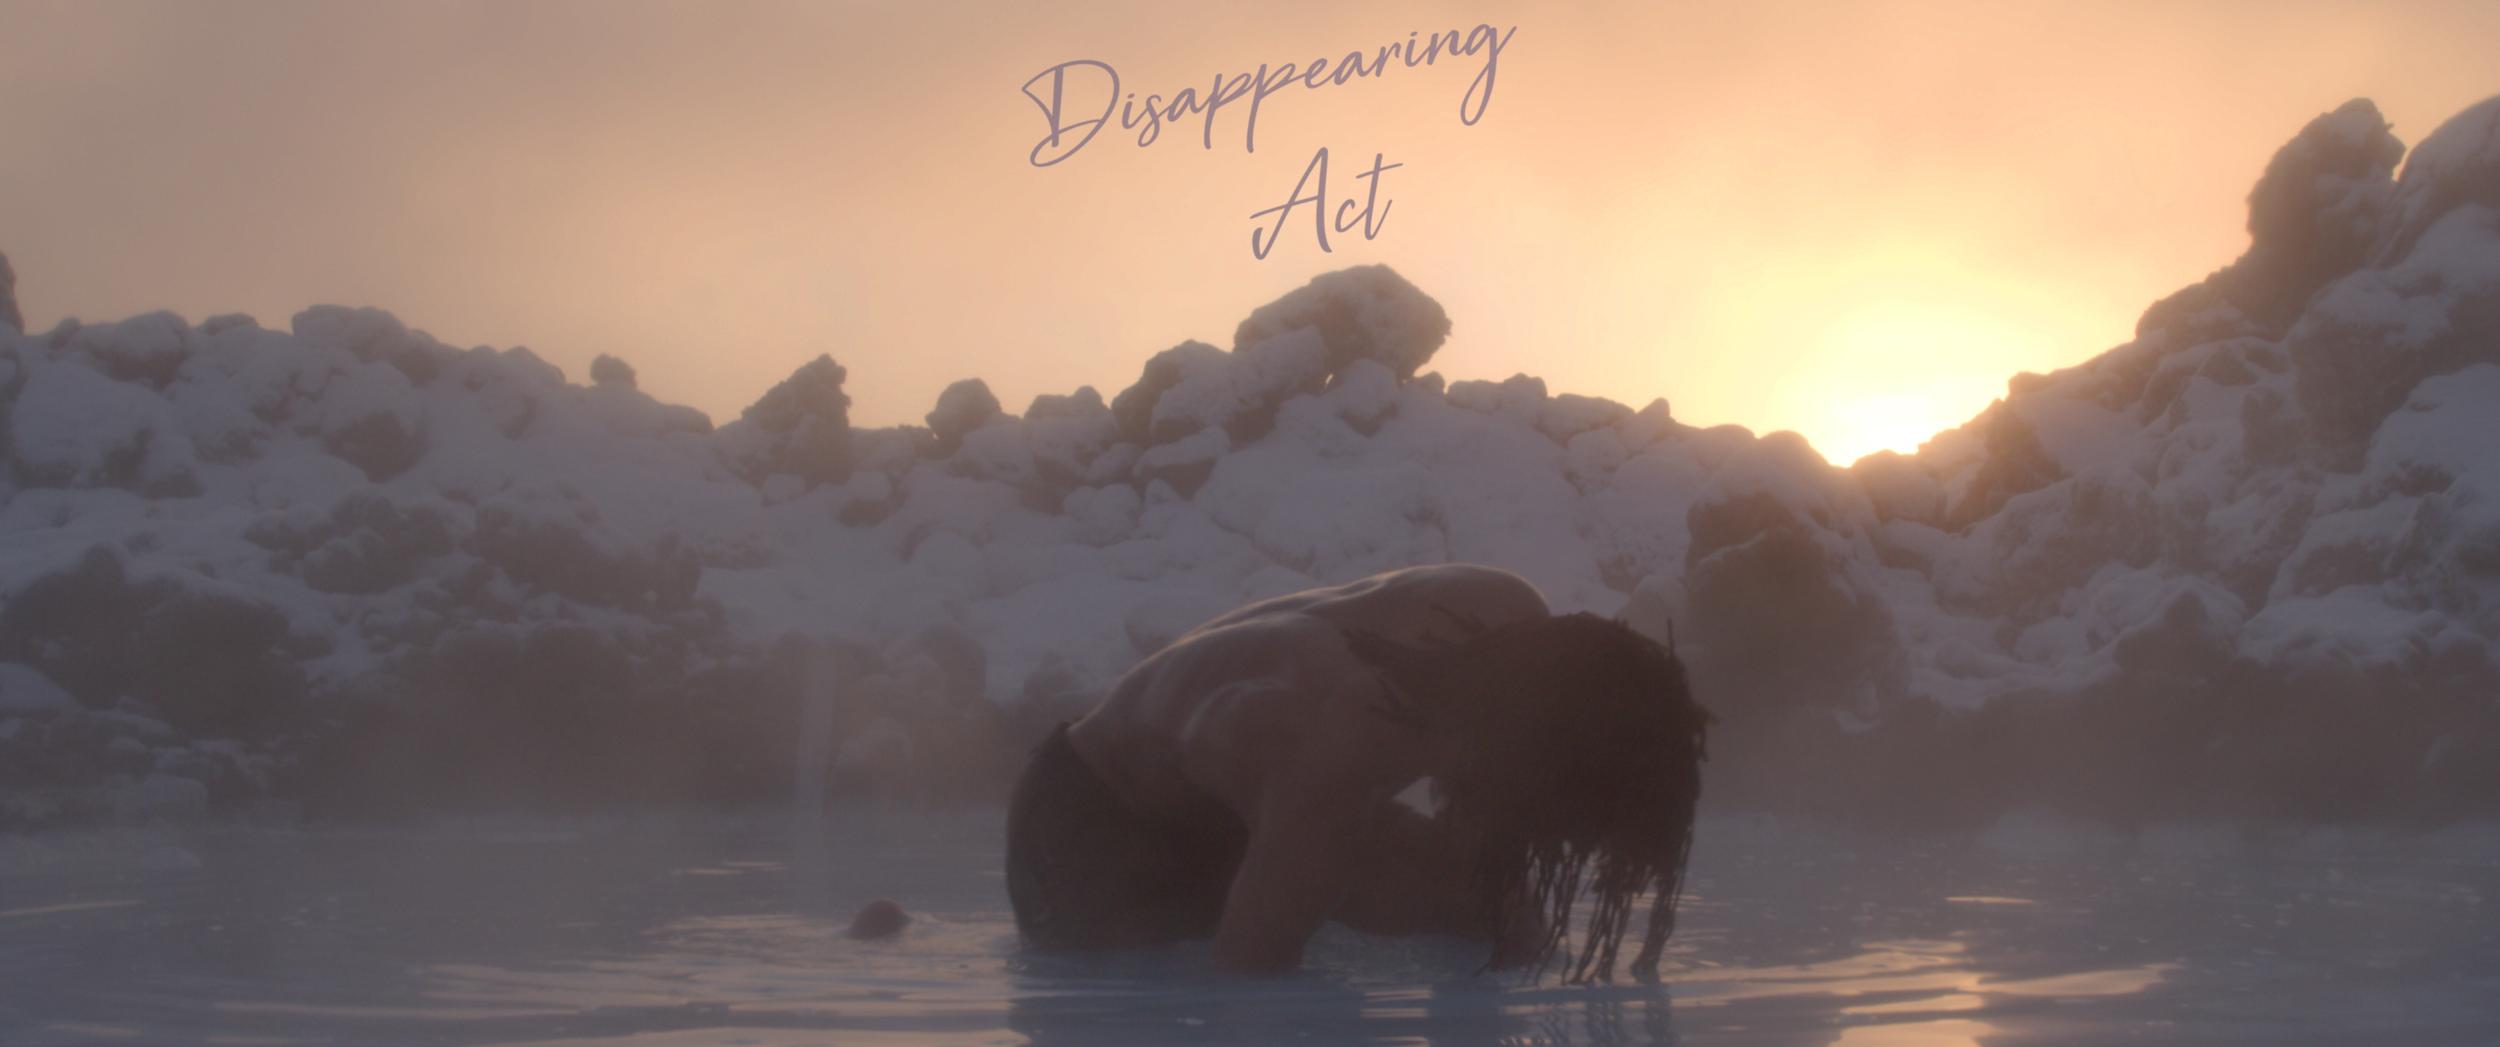 Disappearing Act. DomOfTheYear. (Prod. Flying Lotus & Skhyehutch) Camera, Edit. Iceland